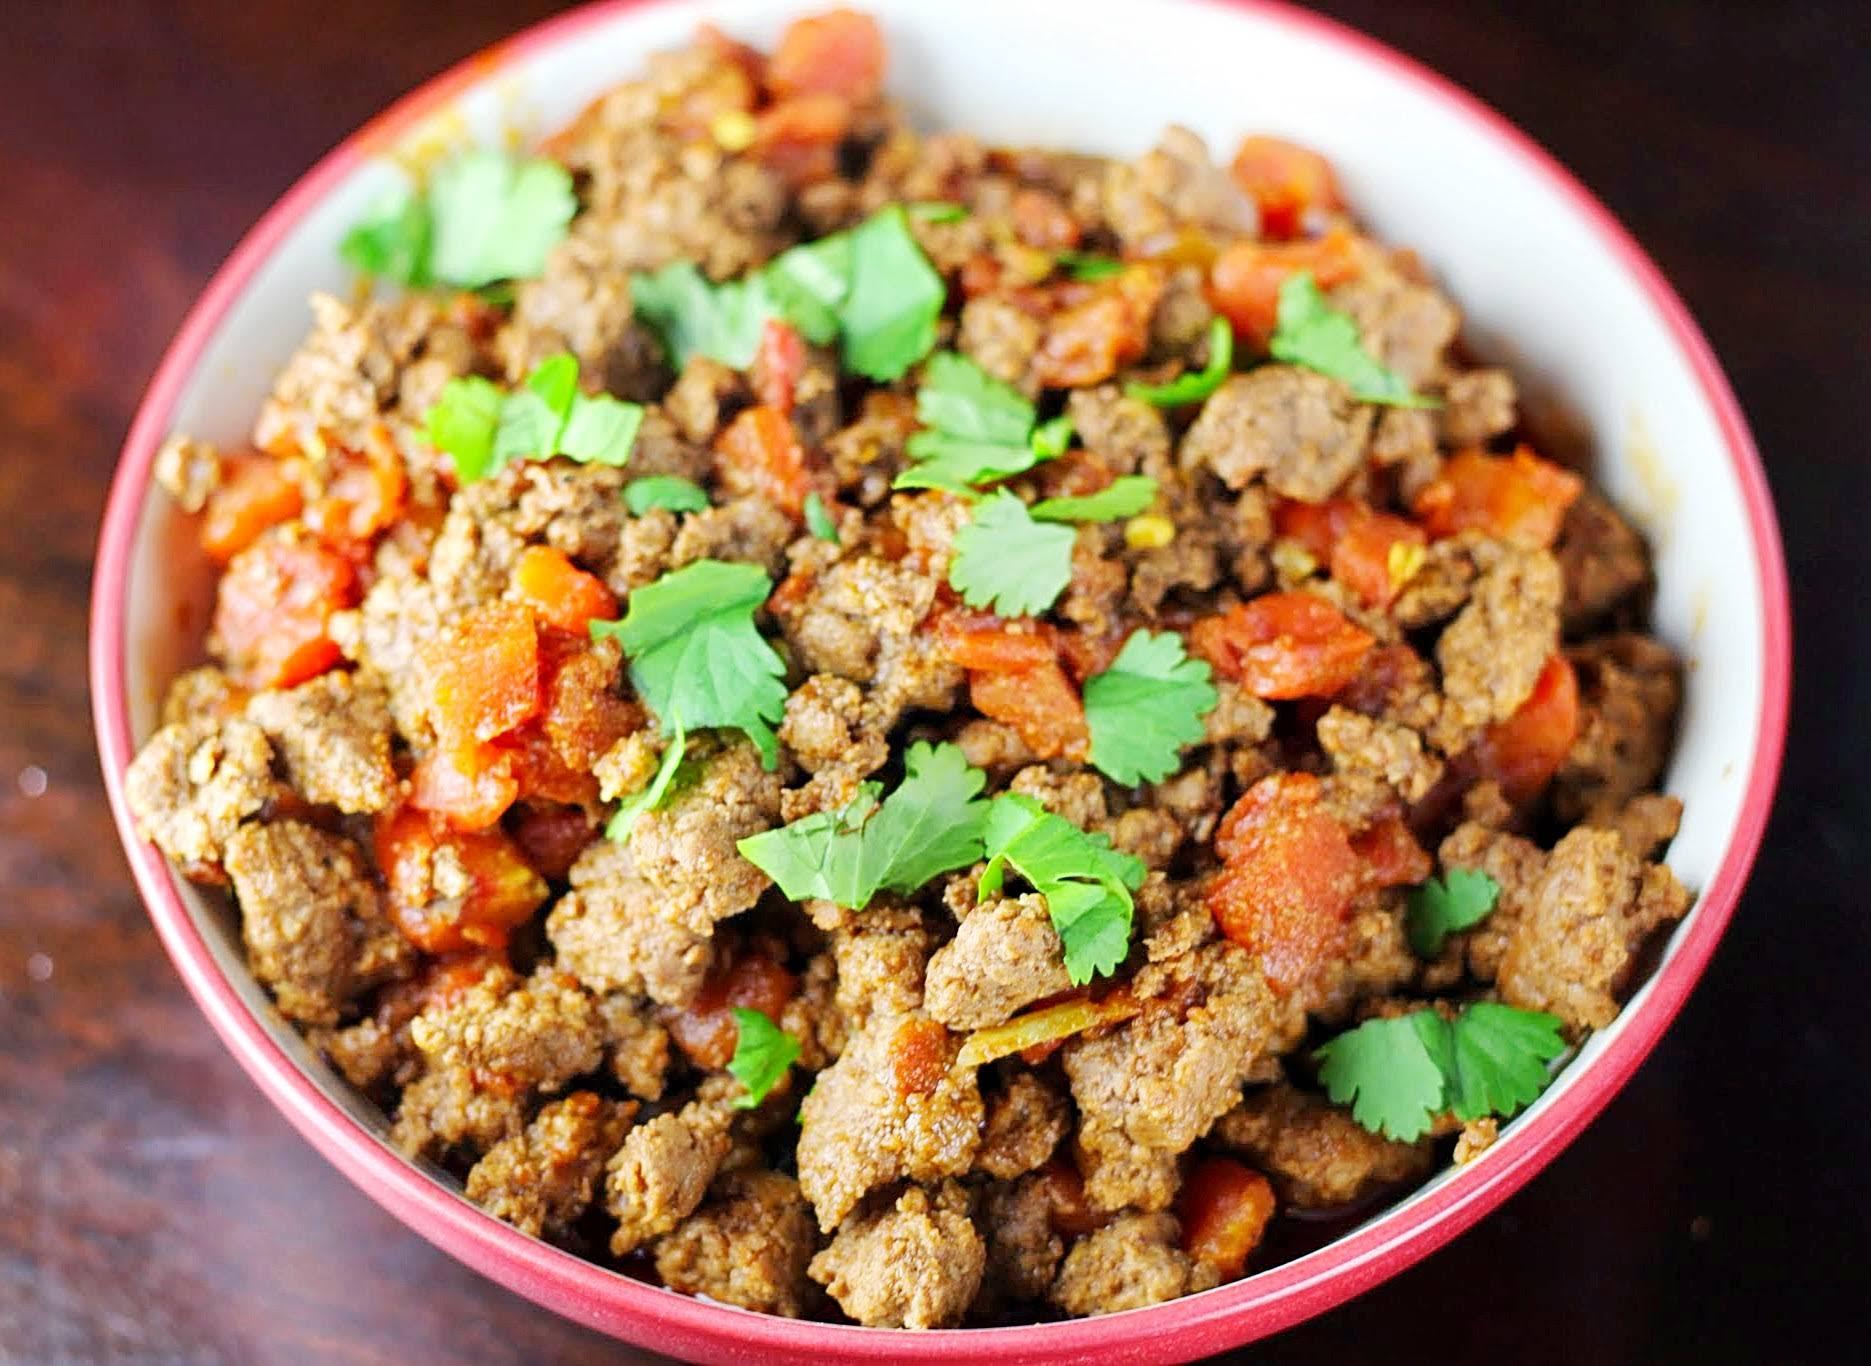 20-Minute Paleo Burrito Bowls with Broccoli Slaw